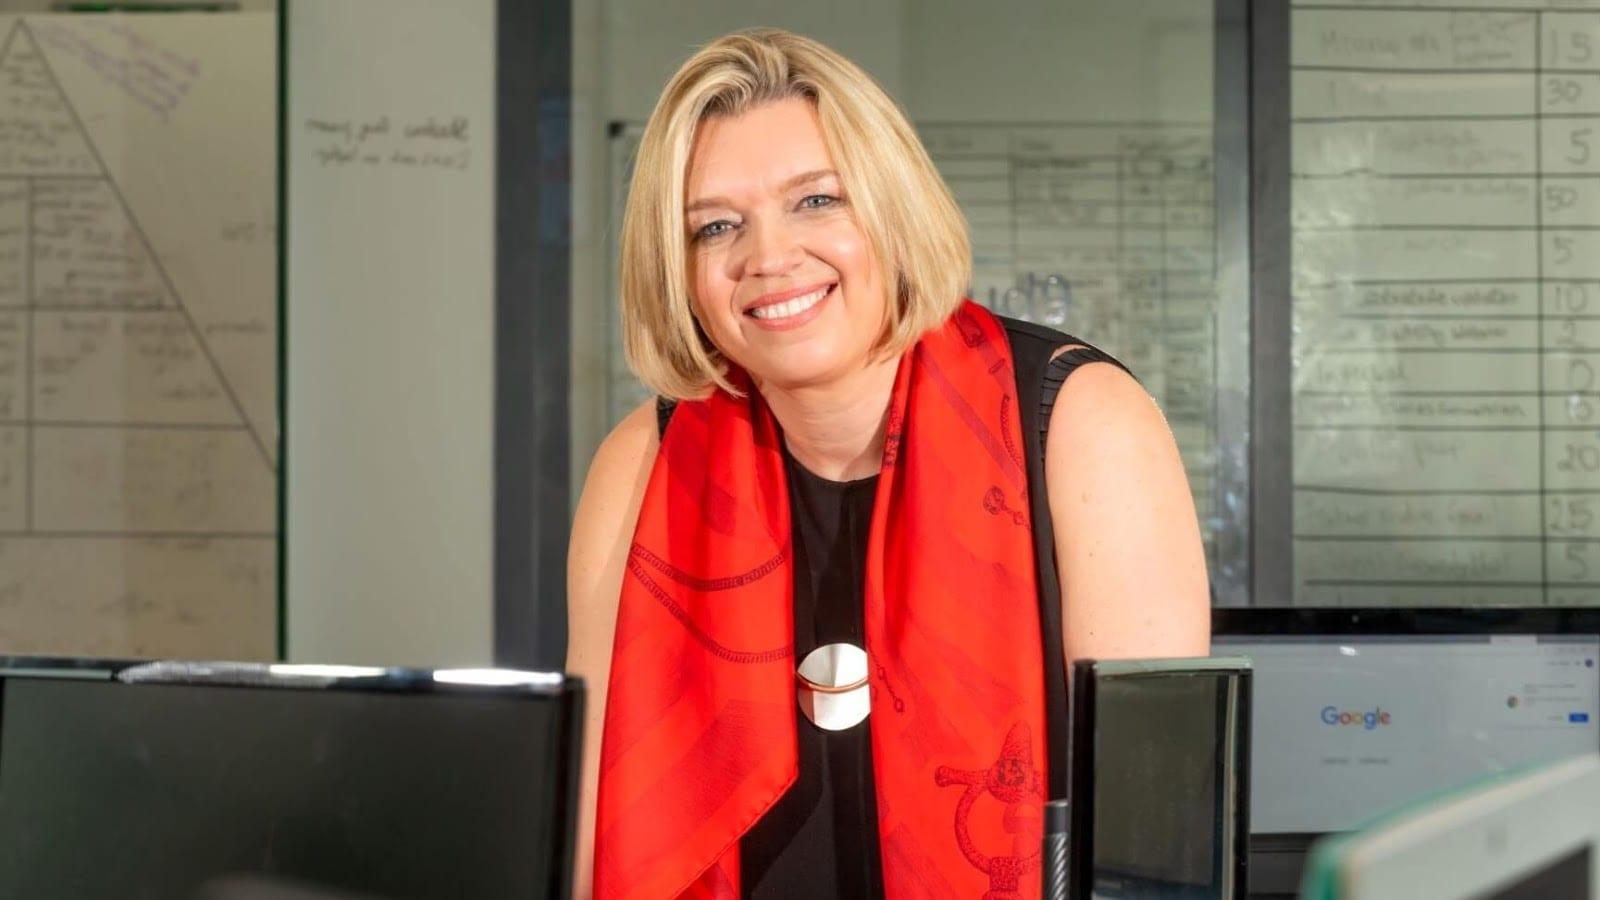 Carlene Jackson CEO of Cloud9